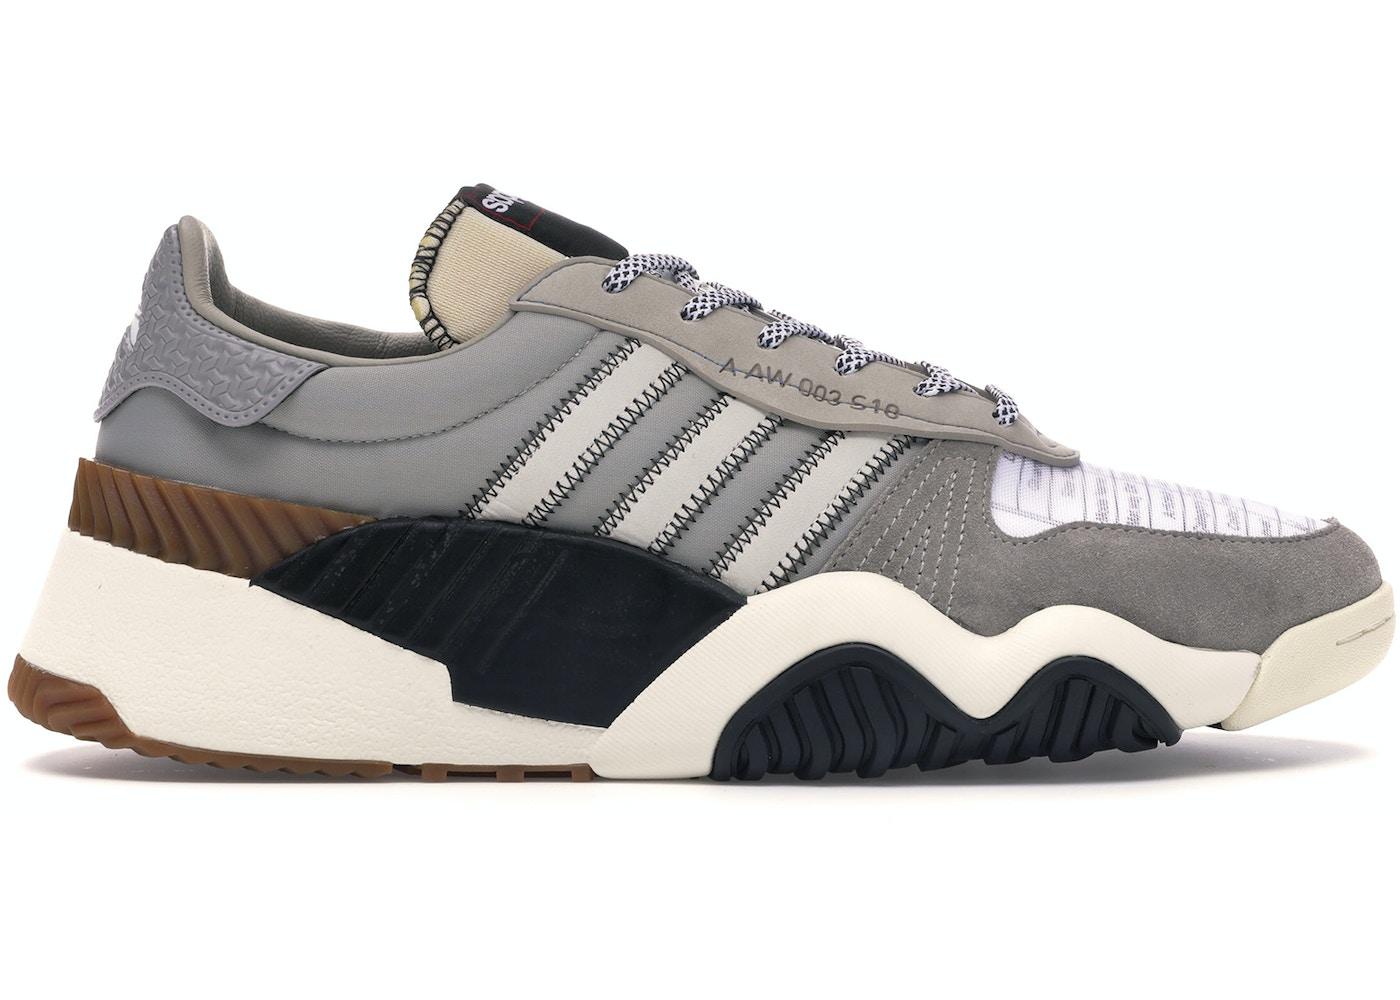 online store 2060c 233ef adidas Turnout Trainer Alexander Wang Light Brown